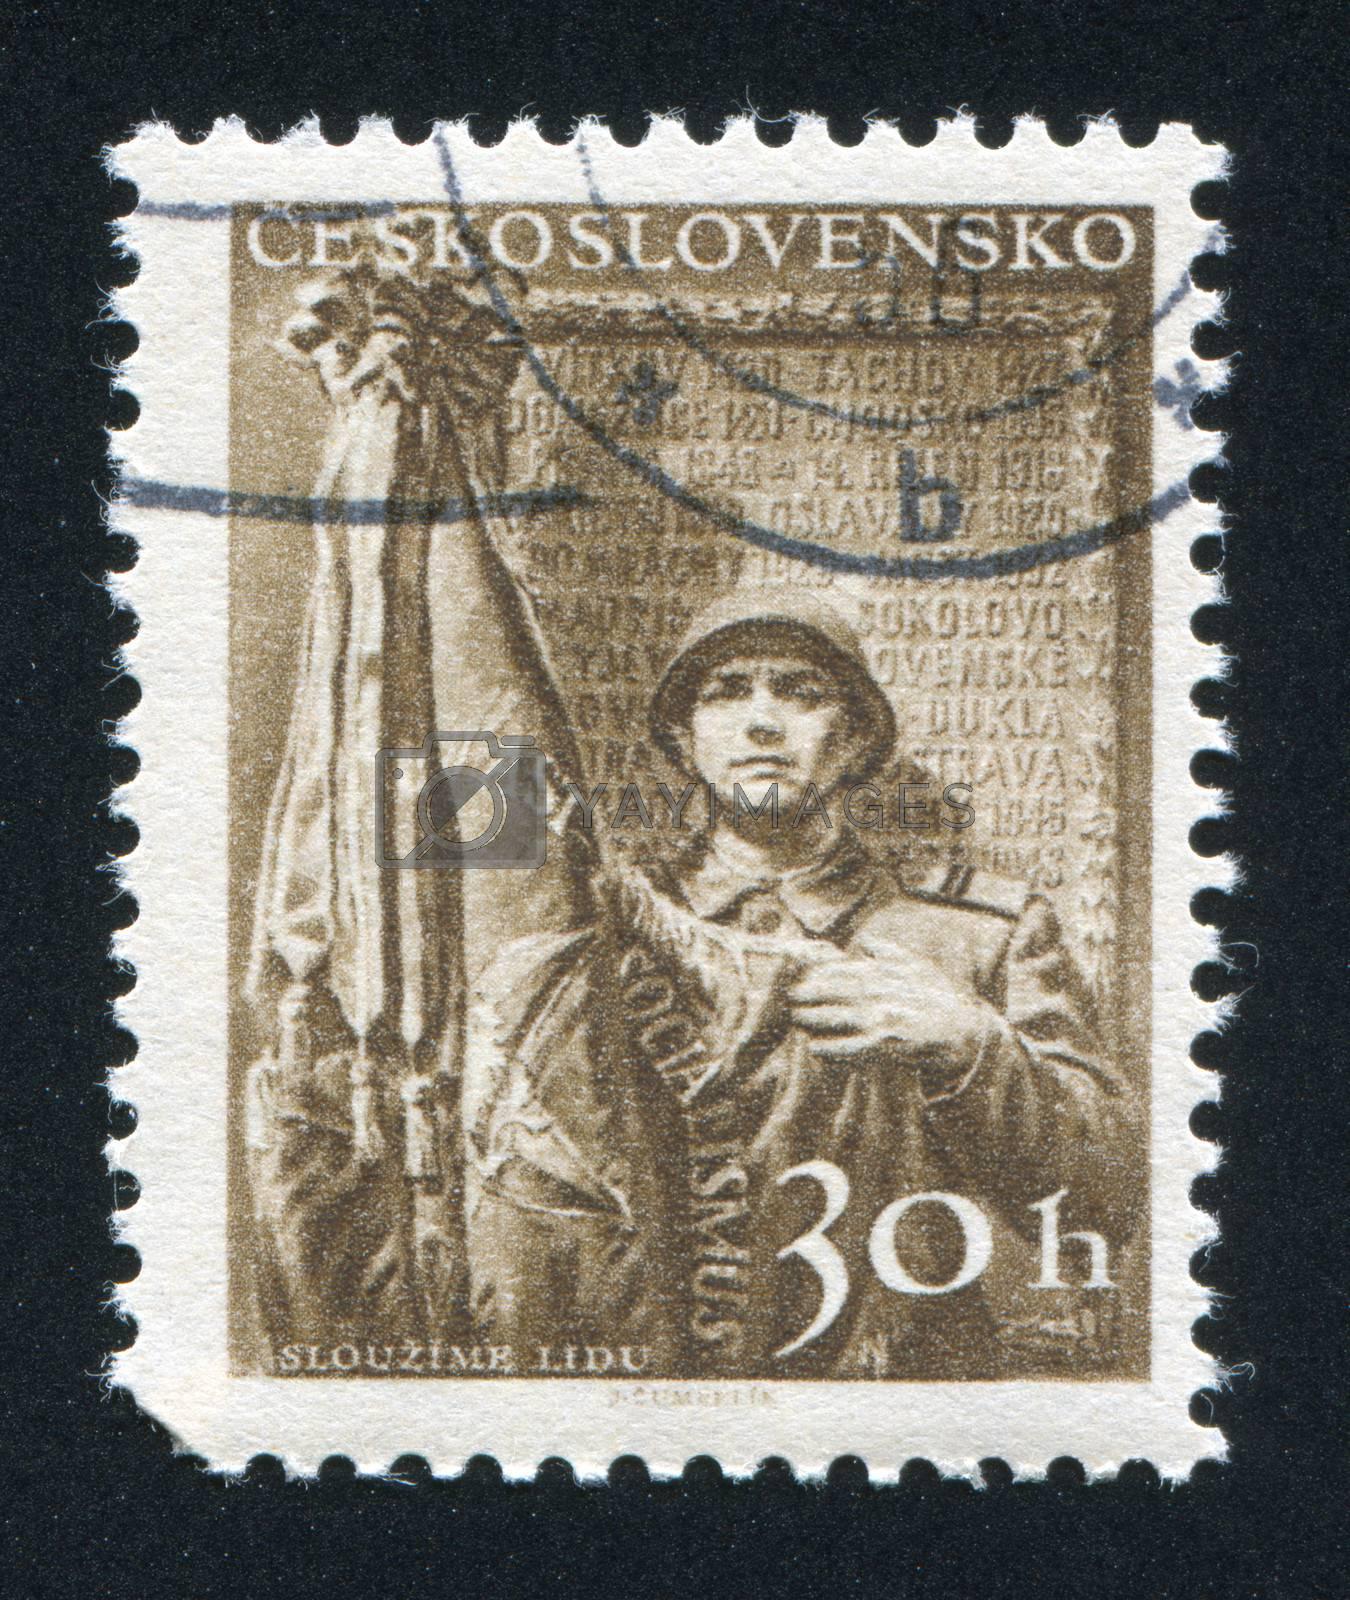 CZECHOSLOVAKIA - CIRCA 1956: stamp printed by Czechoslovakia, shows ���We Serve our People���, circa 1956